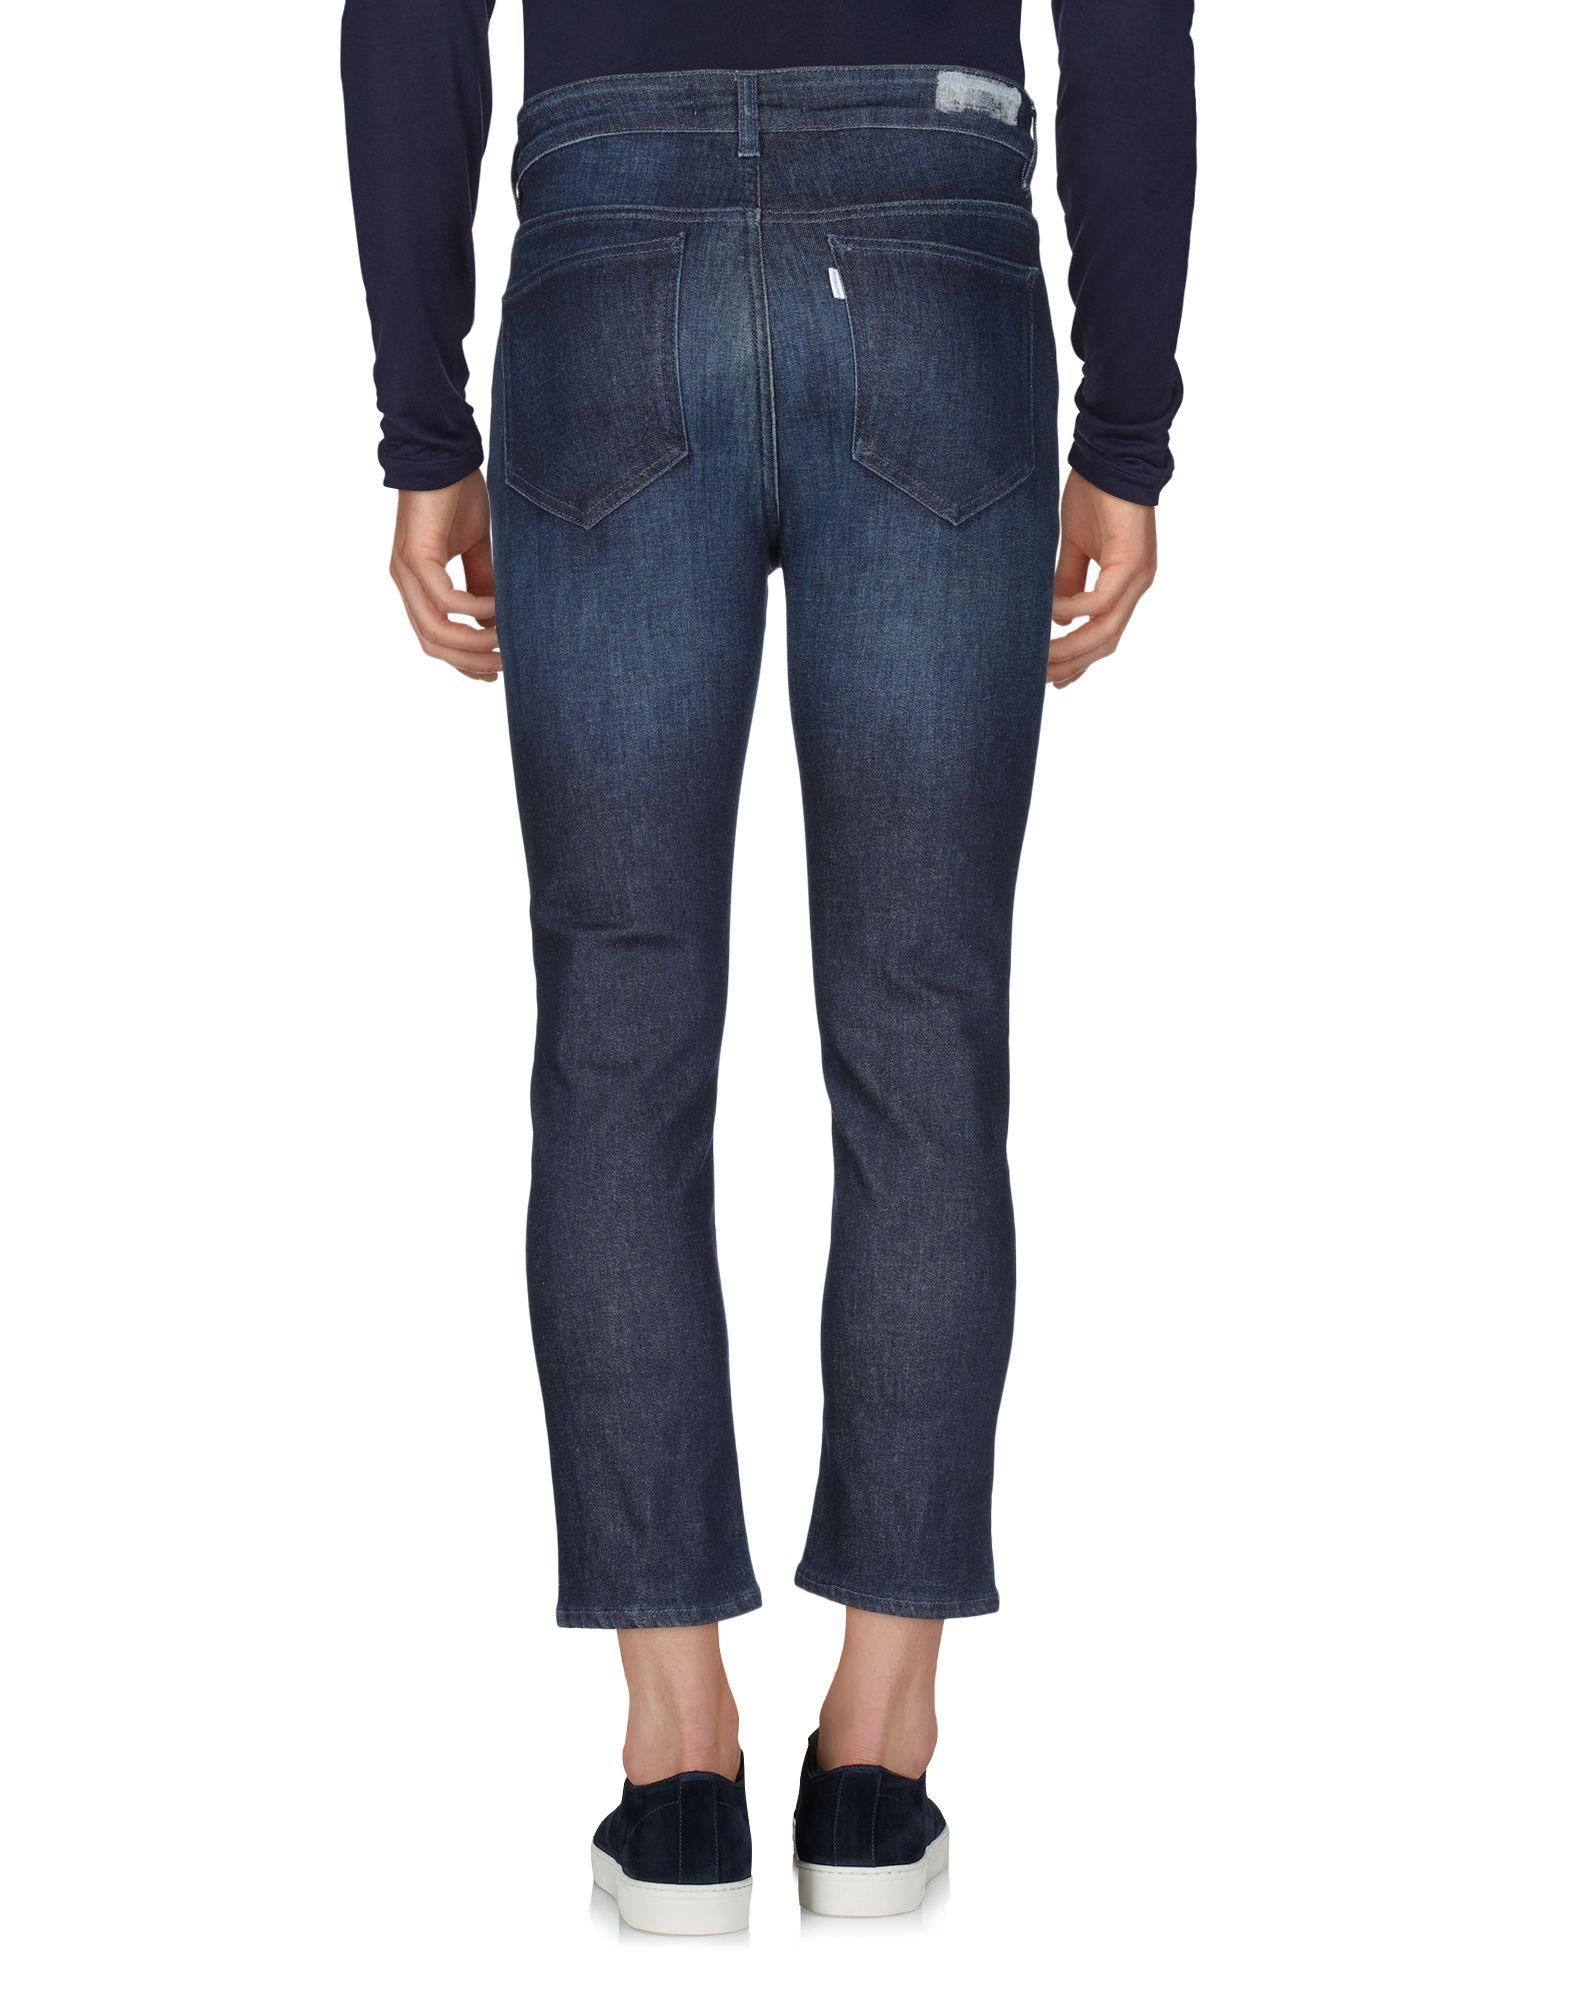 Pantaloni Jeans Haikure Uomo Uomo Haikure - 42687643CG 7f9c48